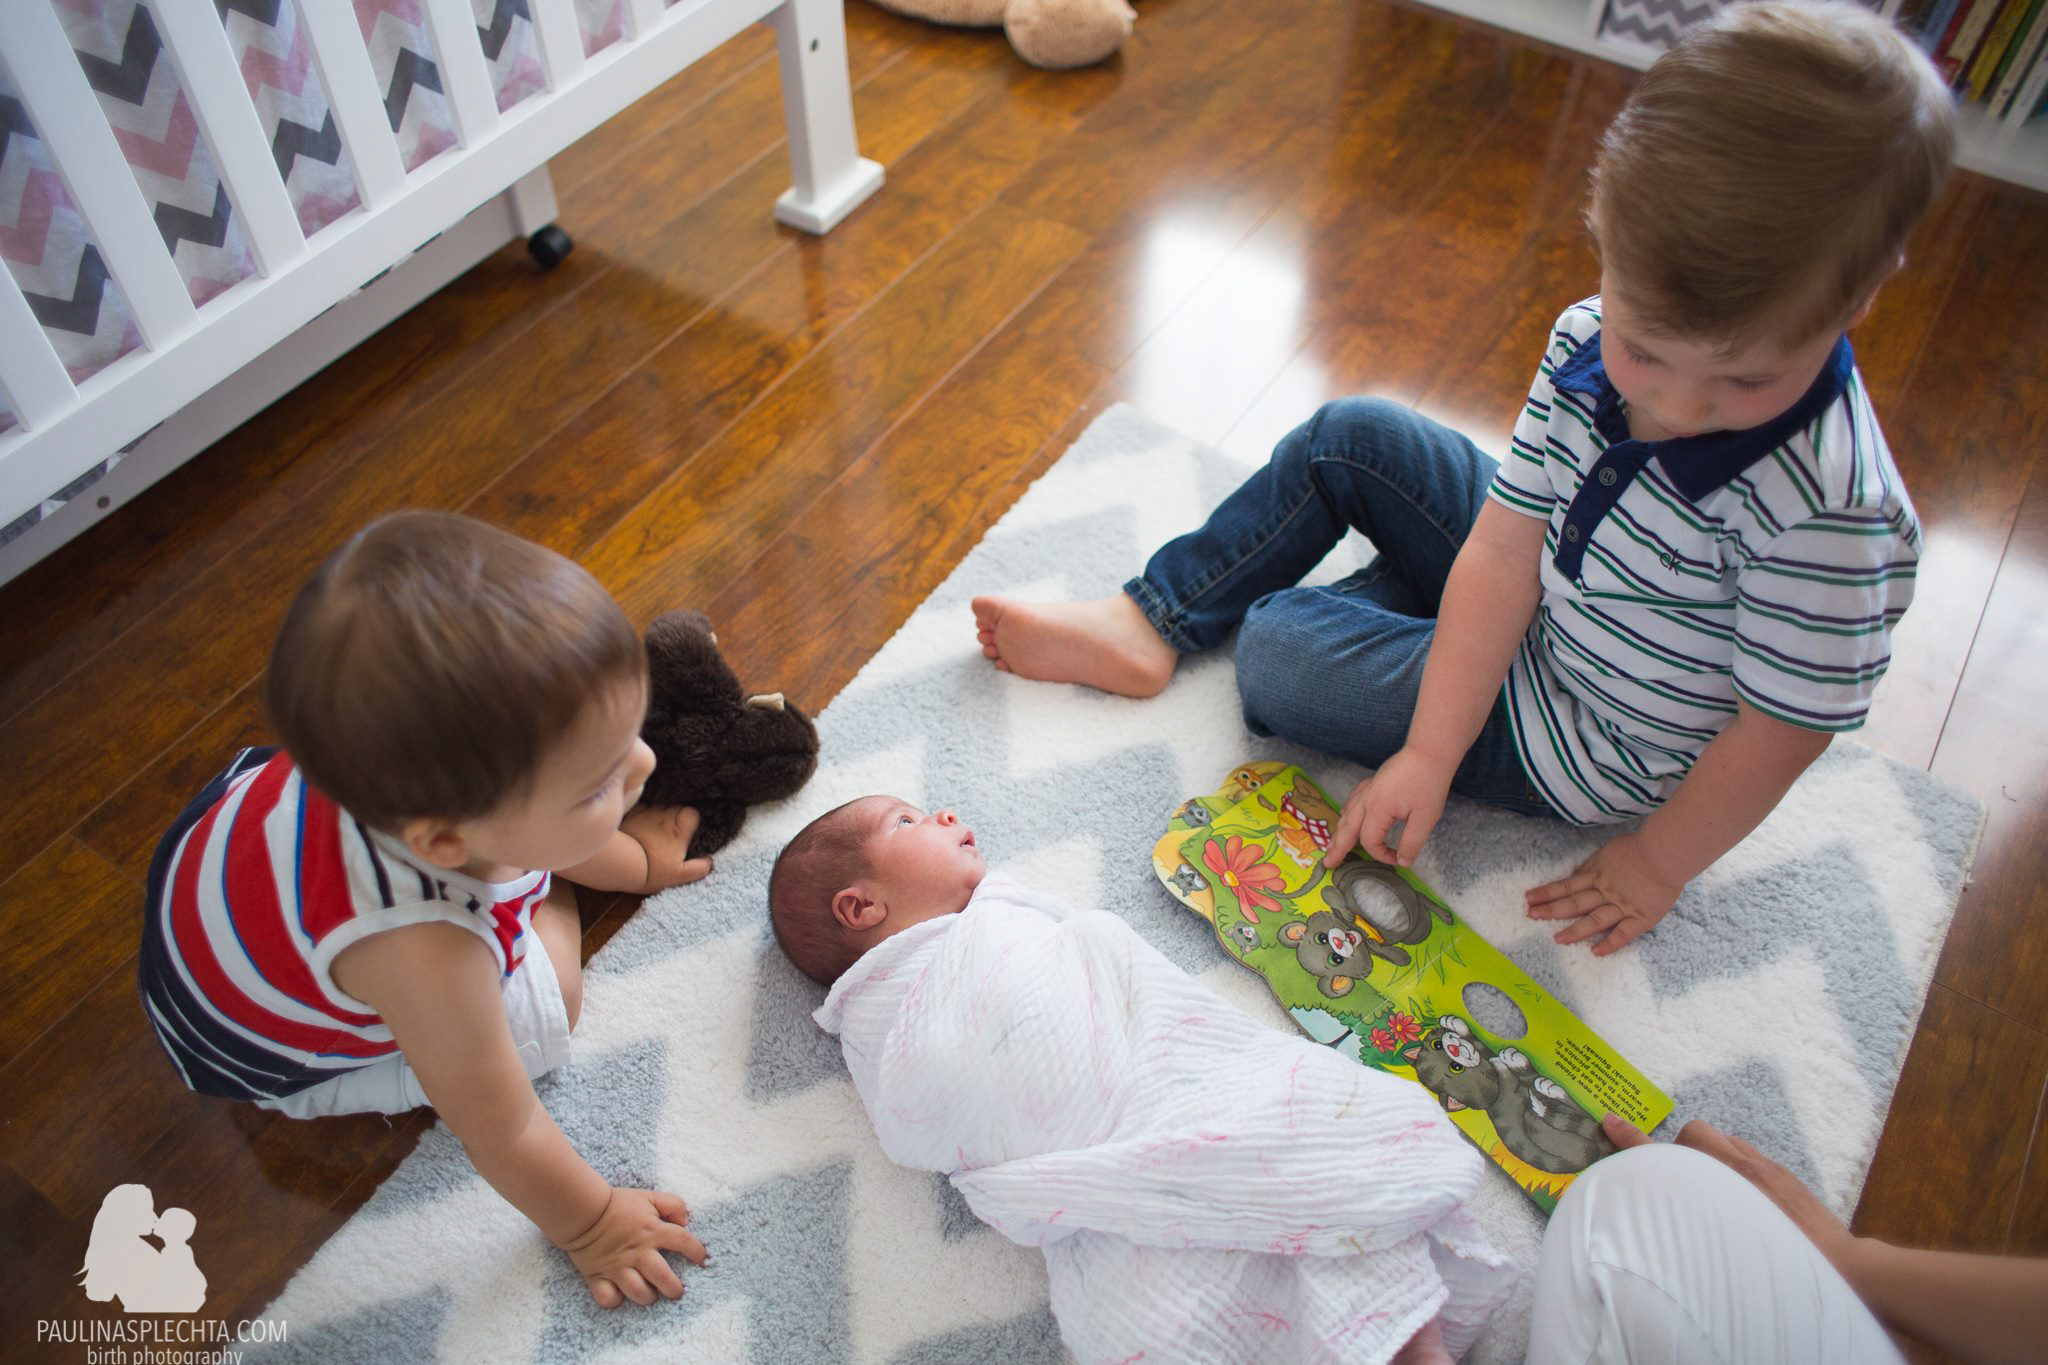 vbac-2vbac-birthwithoutfear-birthphotographer-midwife-womensmidwifery-christinehackshaw-kathyfair-18.jpg